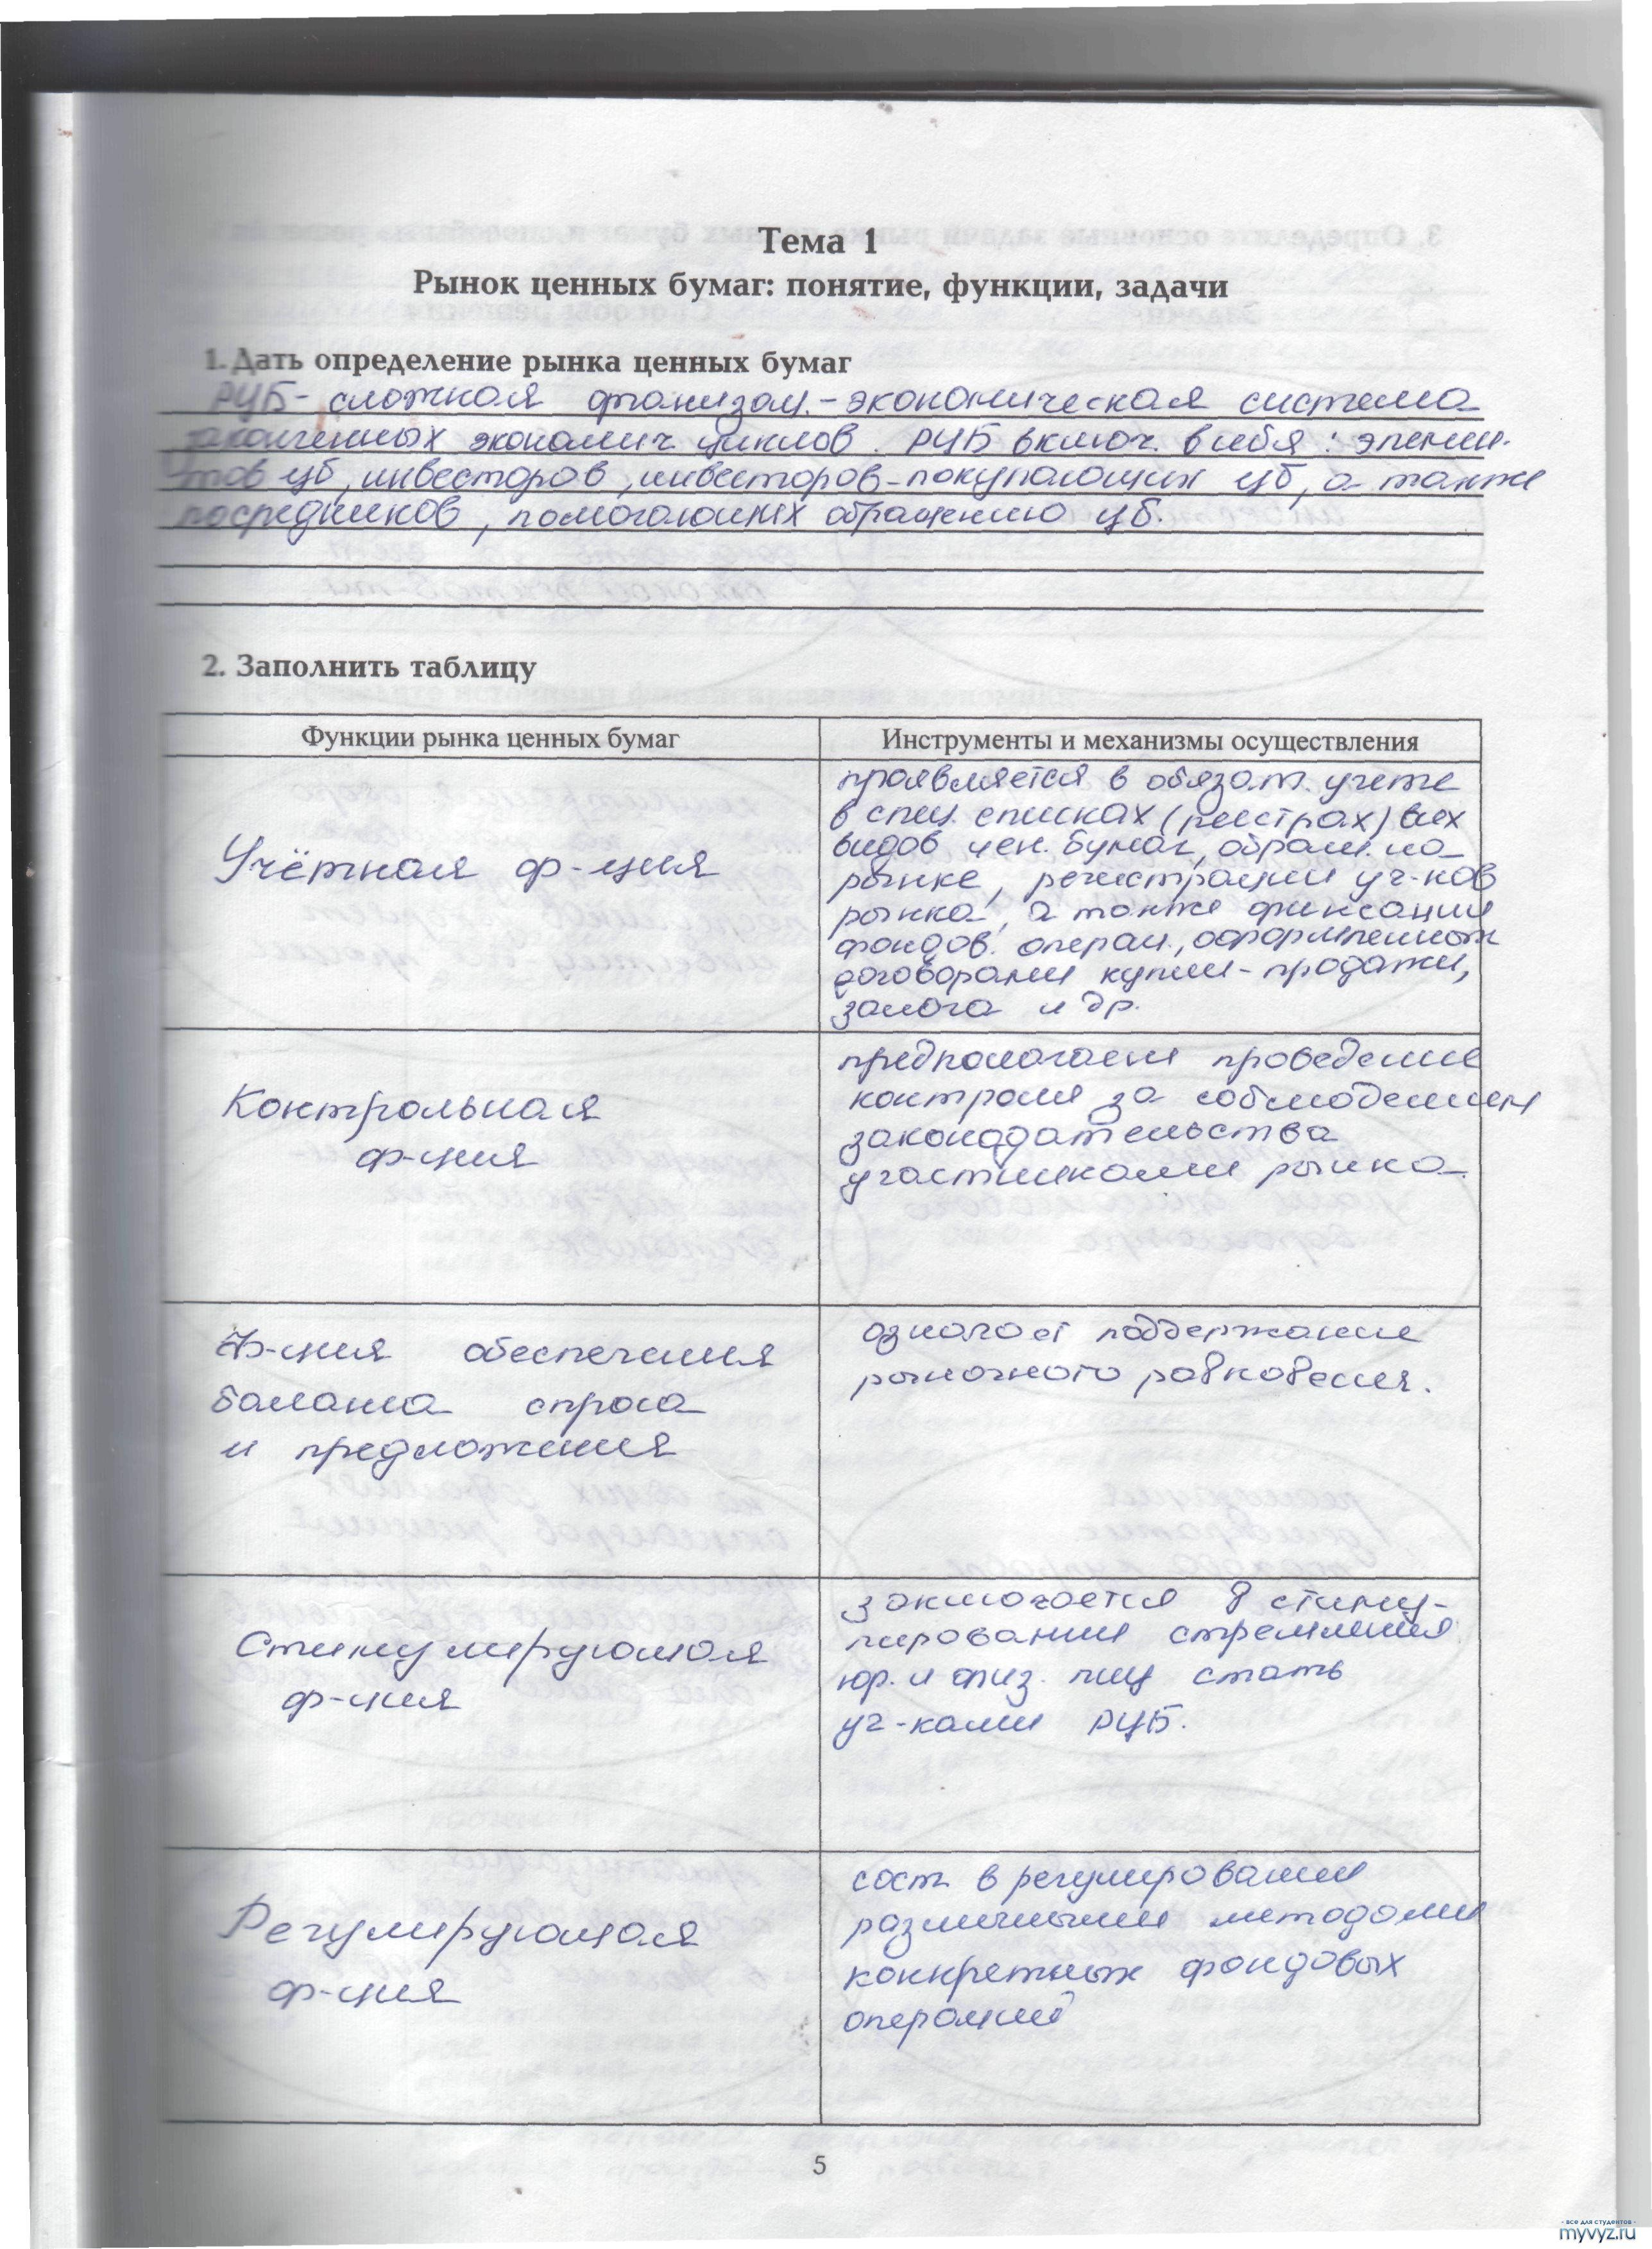 Гдз по башкирскому языку 6 класс усманова габитова абдулхаева упр